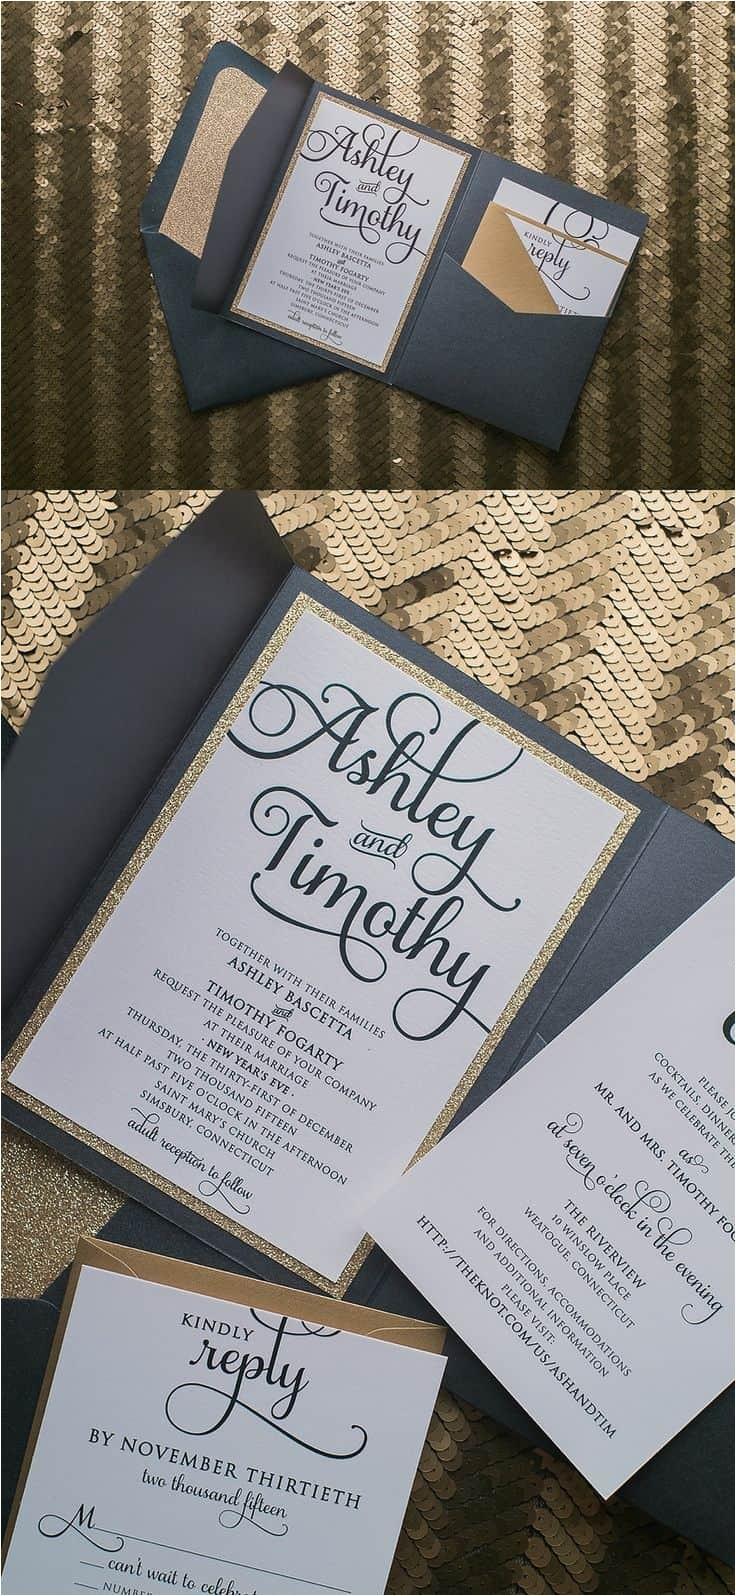 unique ideas for wedding invitations near me ideas alluring layout the egreetingecards com